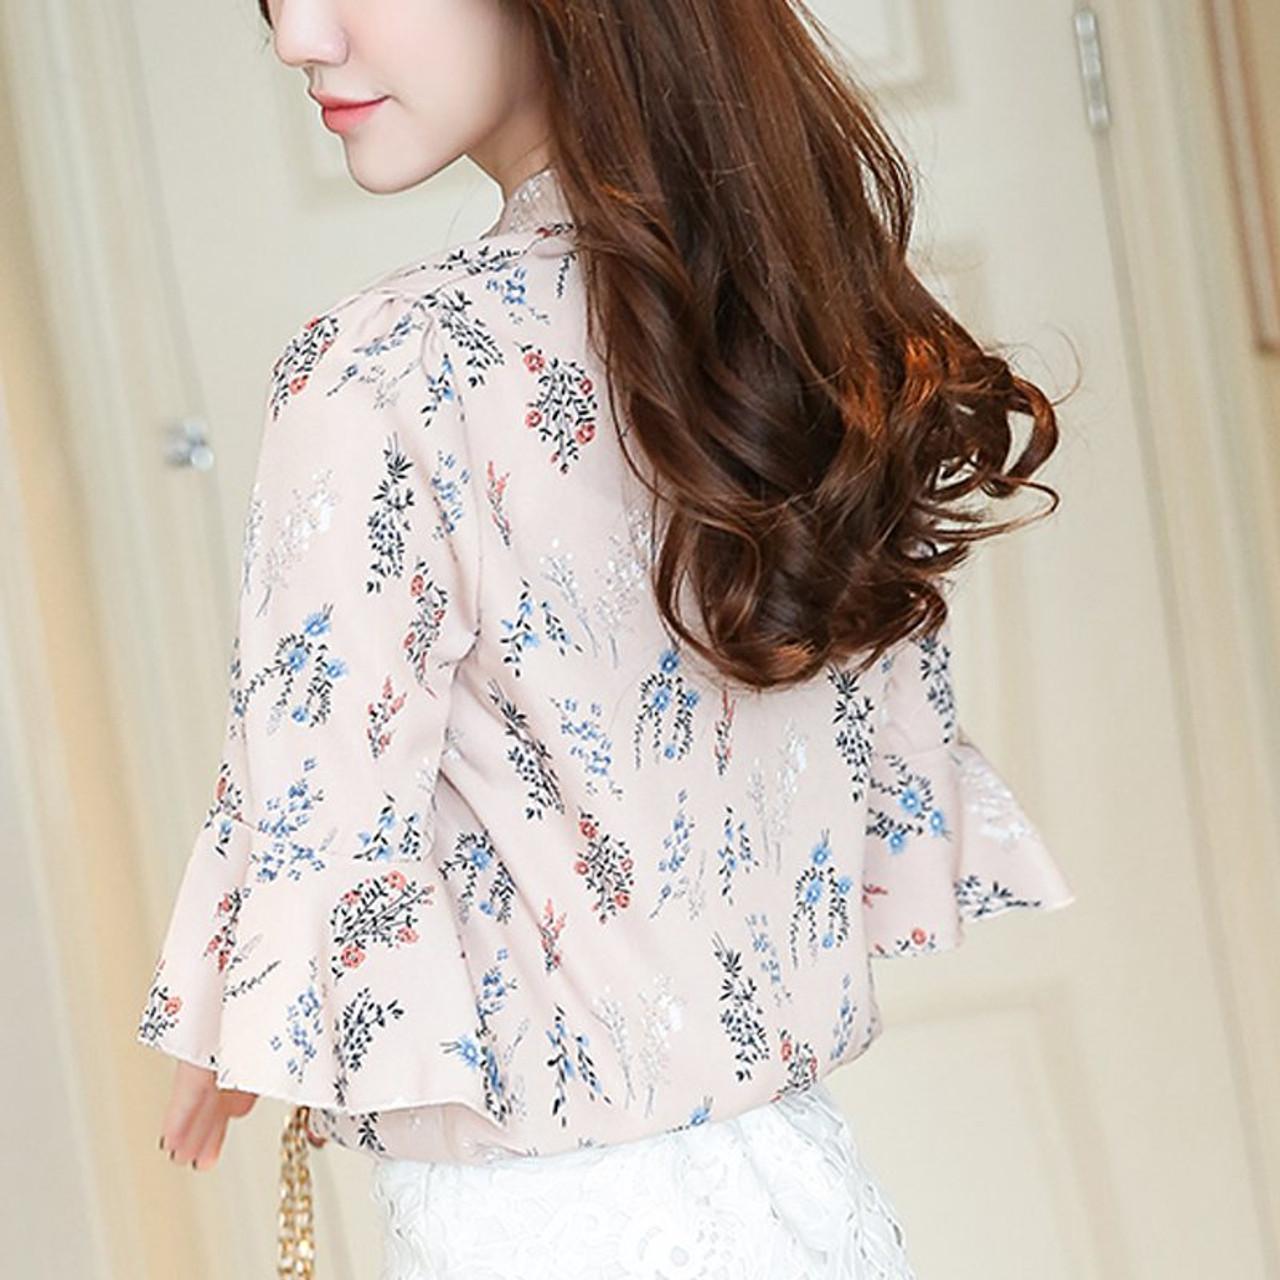 calidad primero 2019 original Cantidad limitada Blusas Femininas 2018 New Fashion Chiffon Blouse Women Printed Blouses  Floral Print Shirts Summer Ladies Tops Big Size